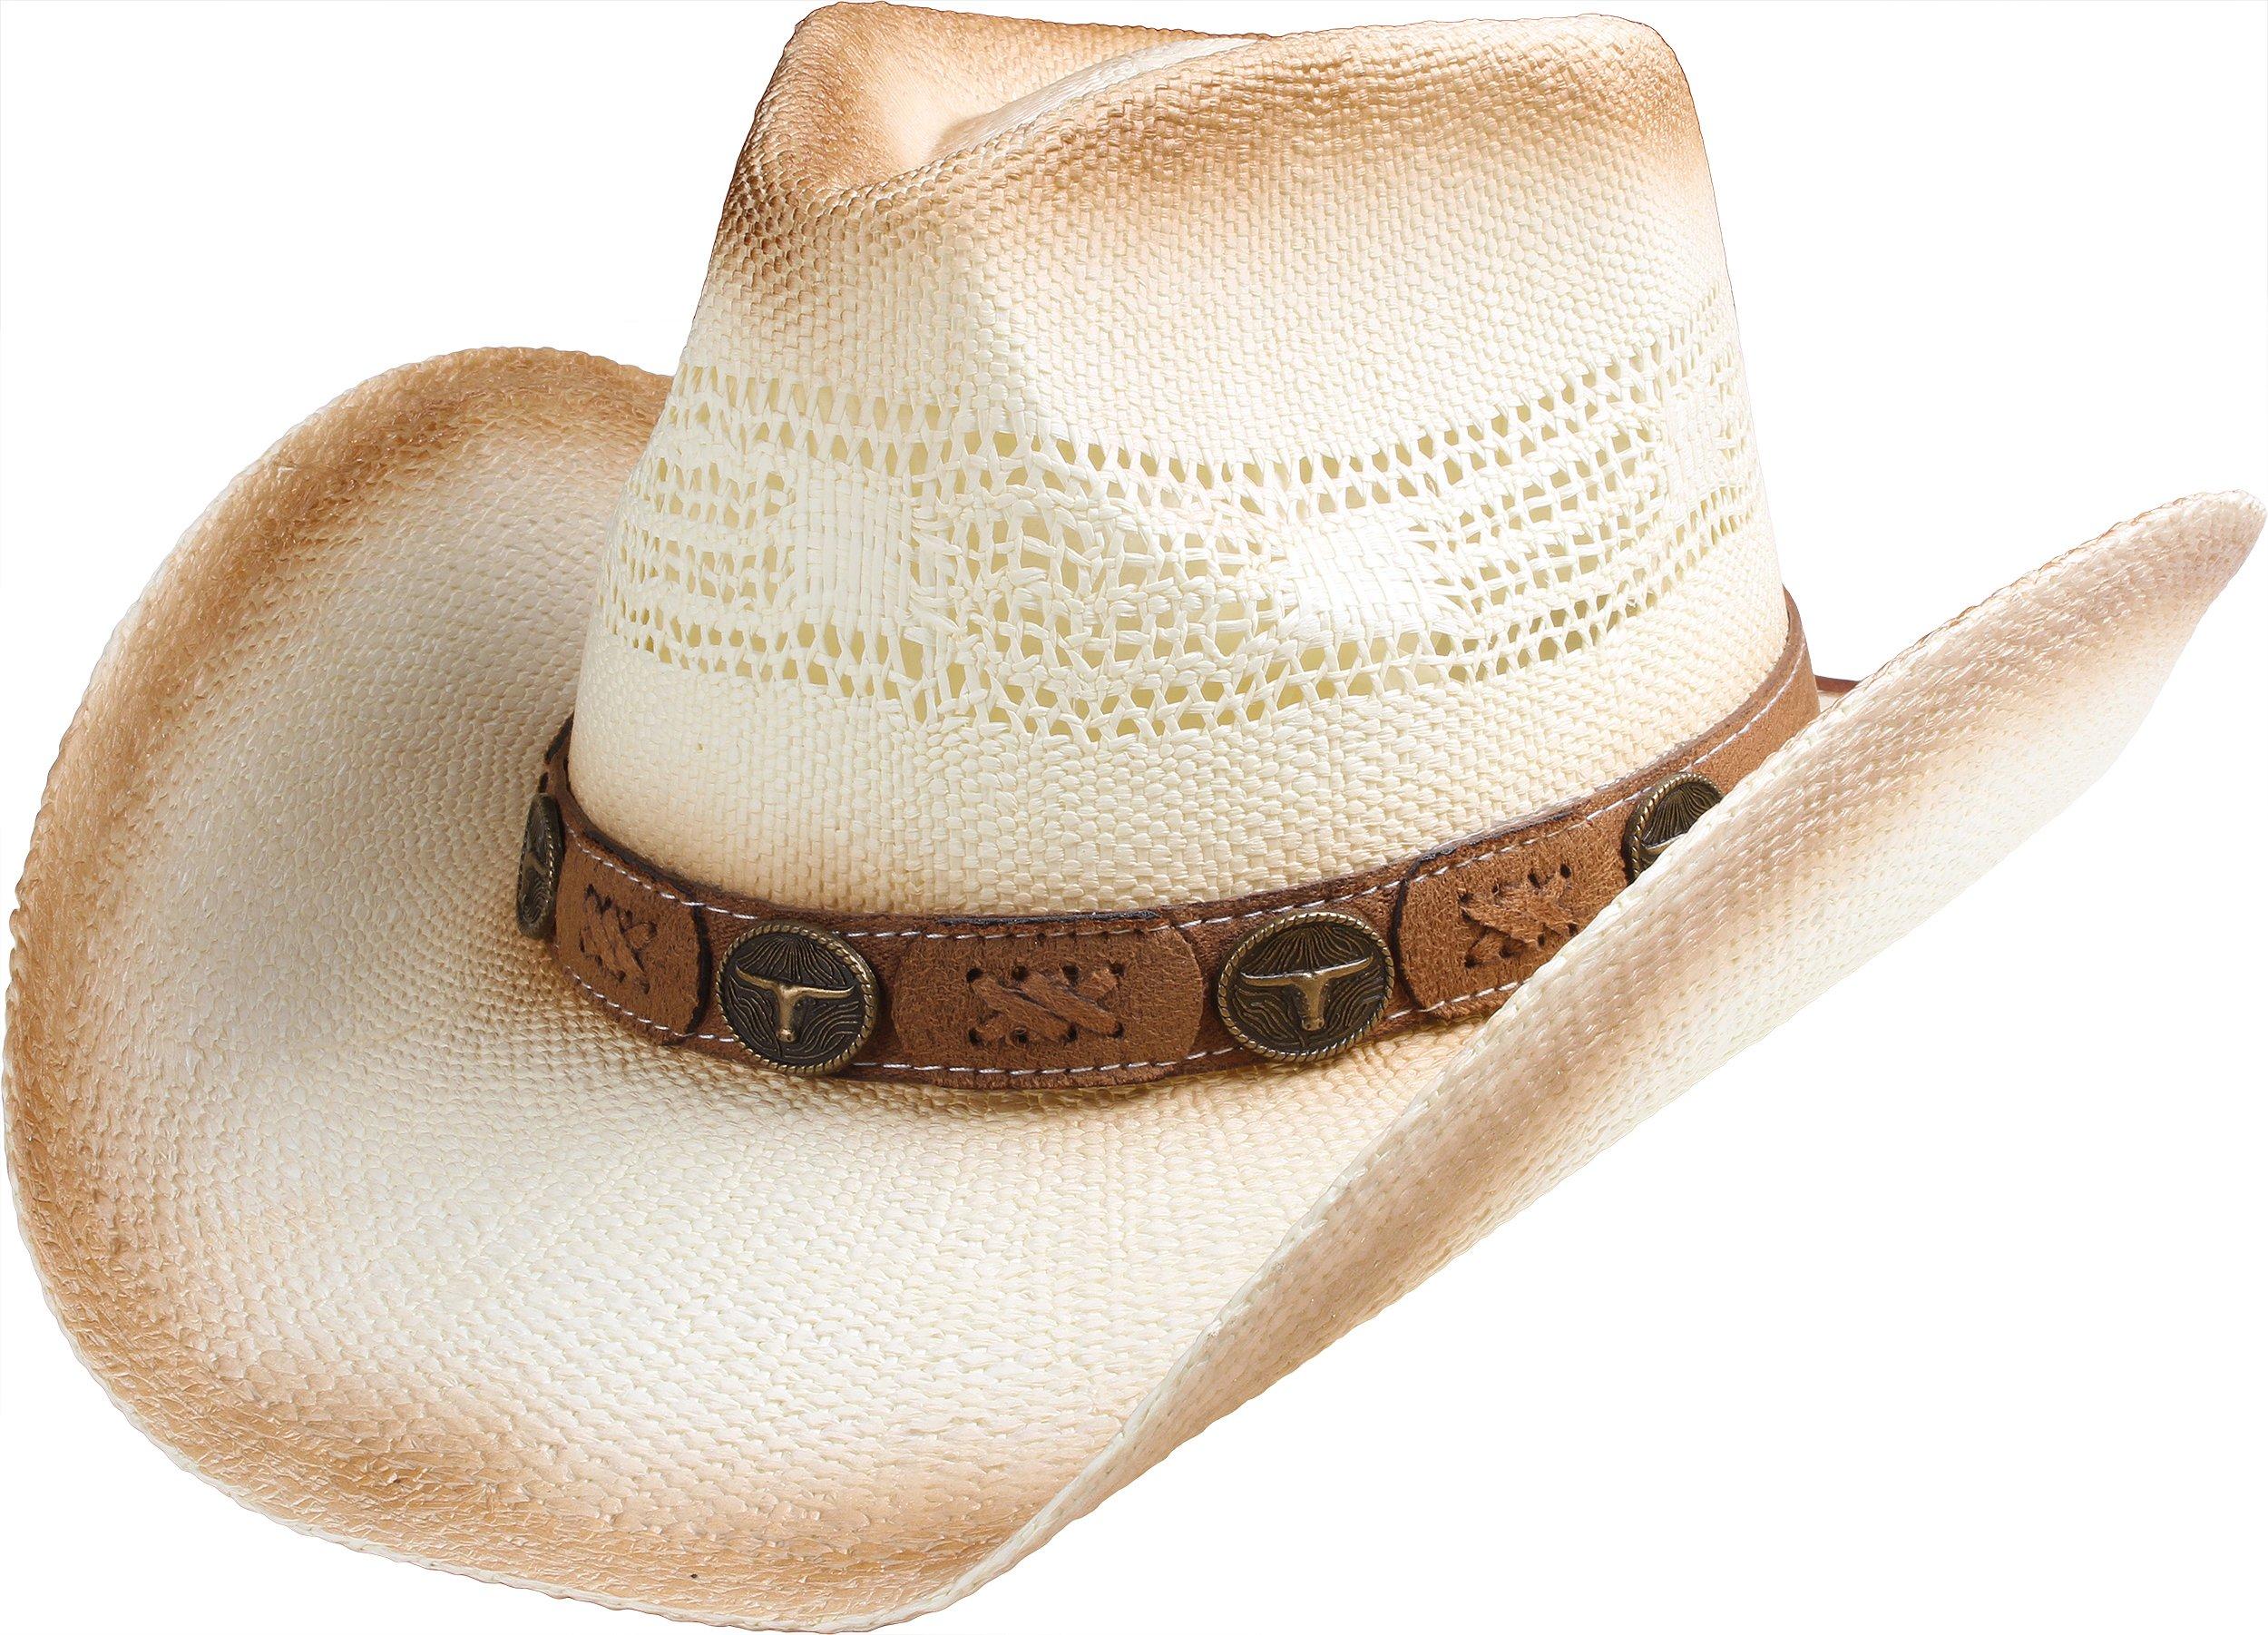 b4118f9f35cbd Queue Essentials Straw Cowboy Hat for Men Cowgirl Hat for Women Western  Wide Brim Hat Hats